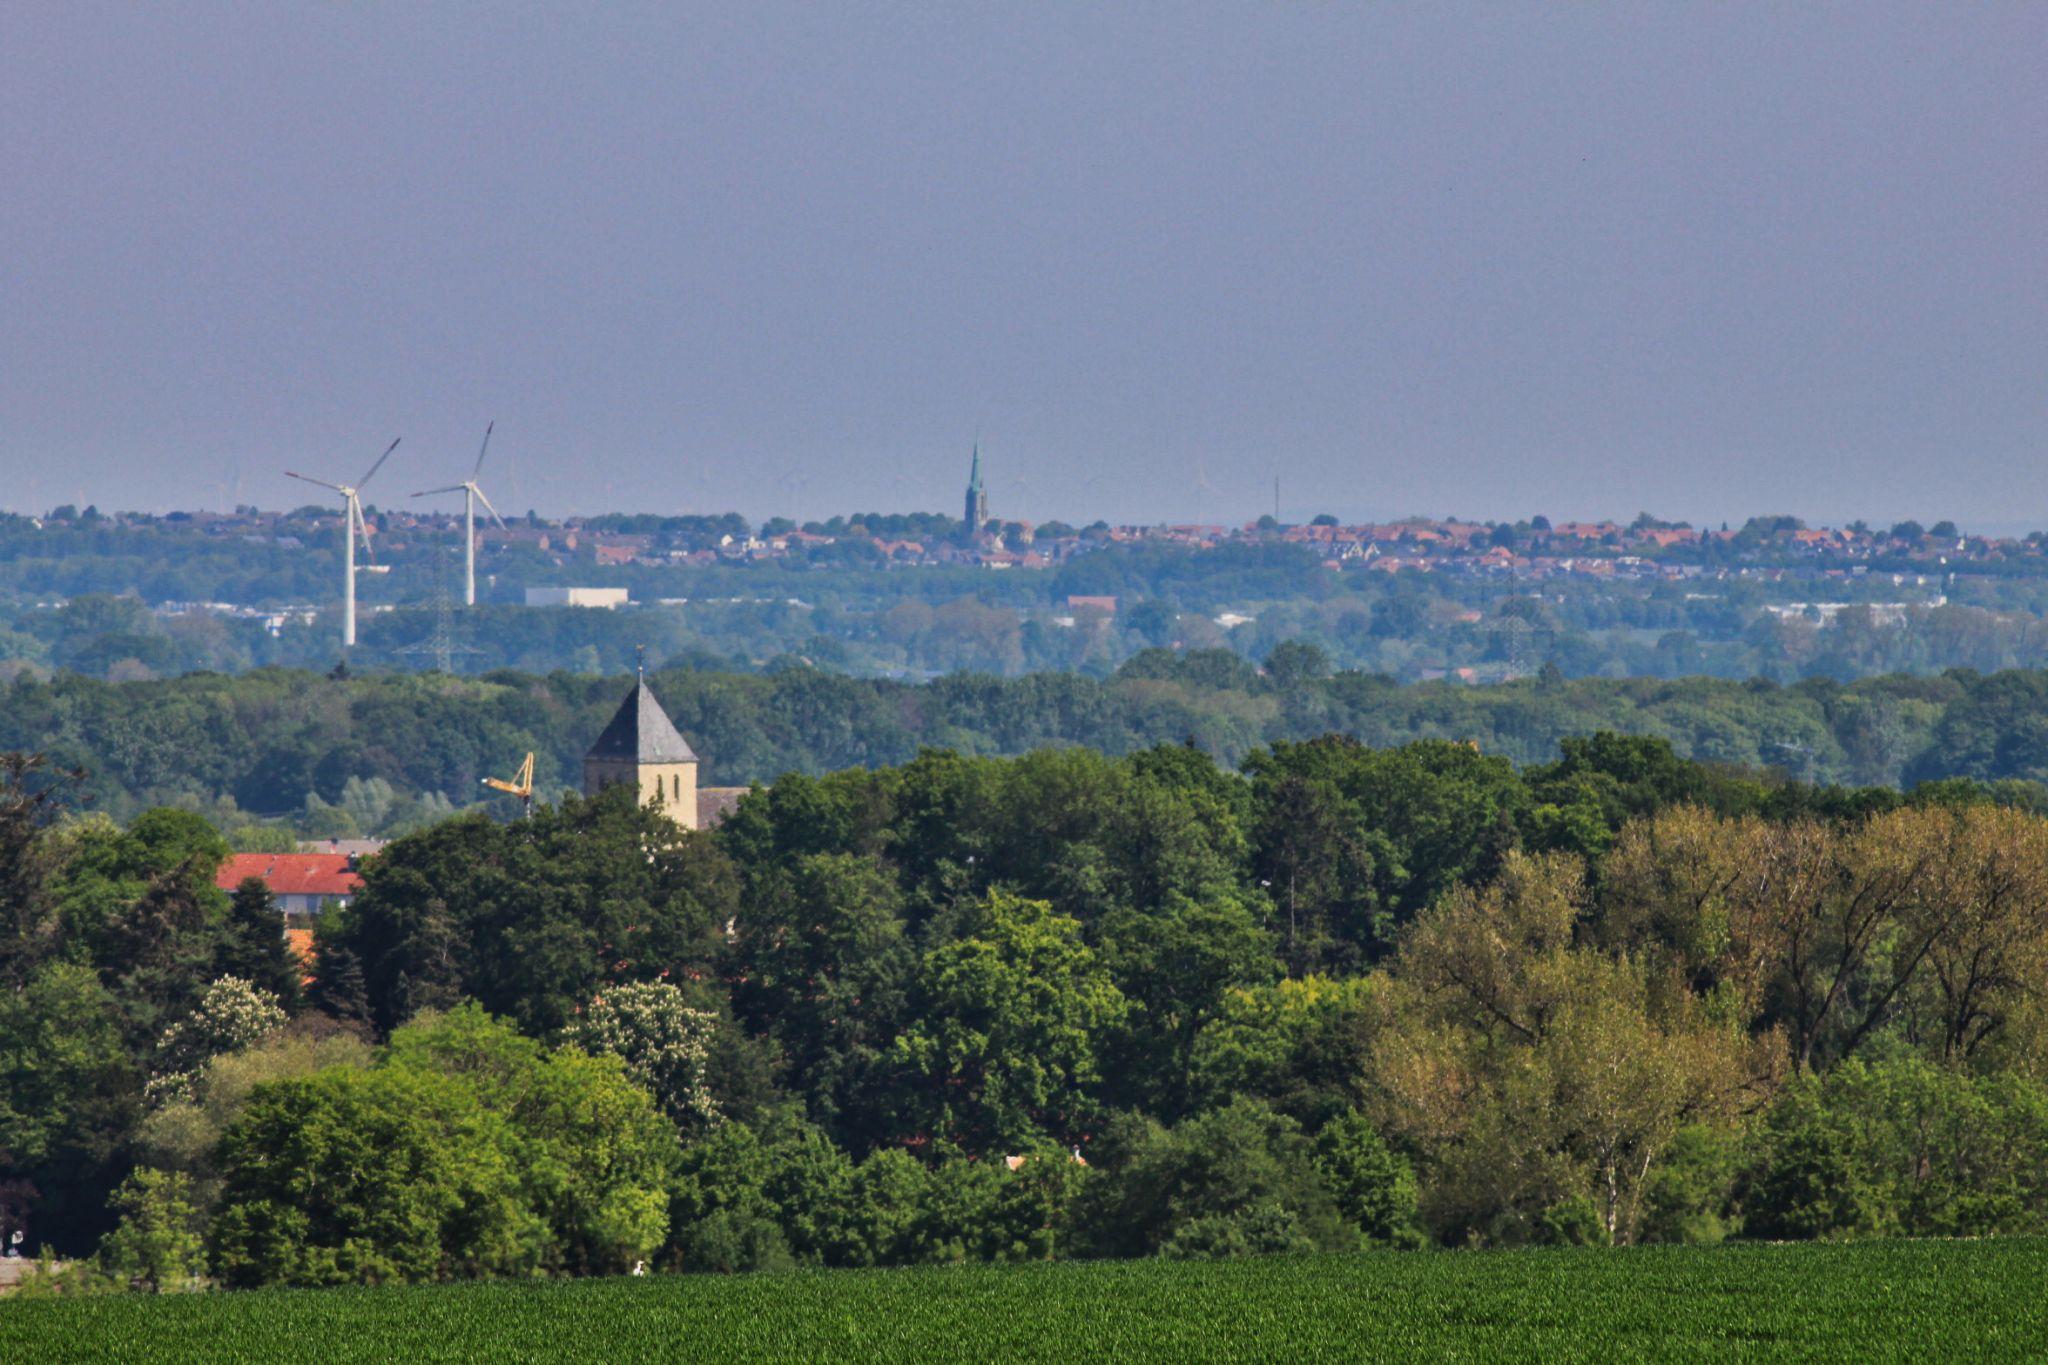 Blick auf Havixbeck, Germany